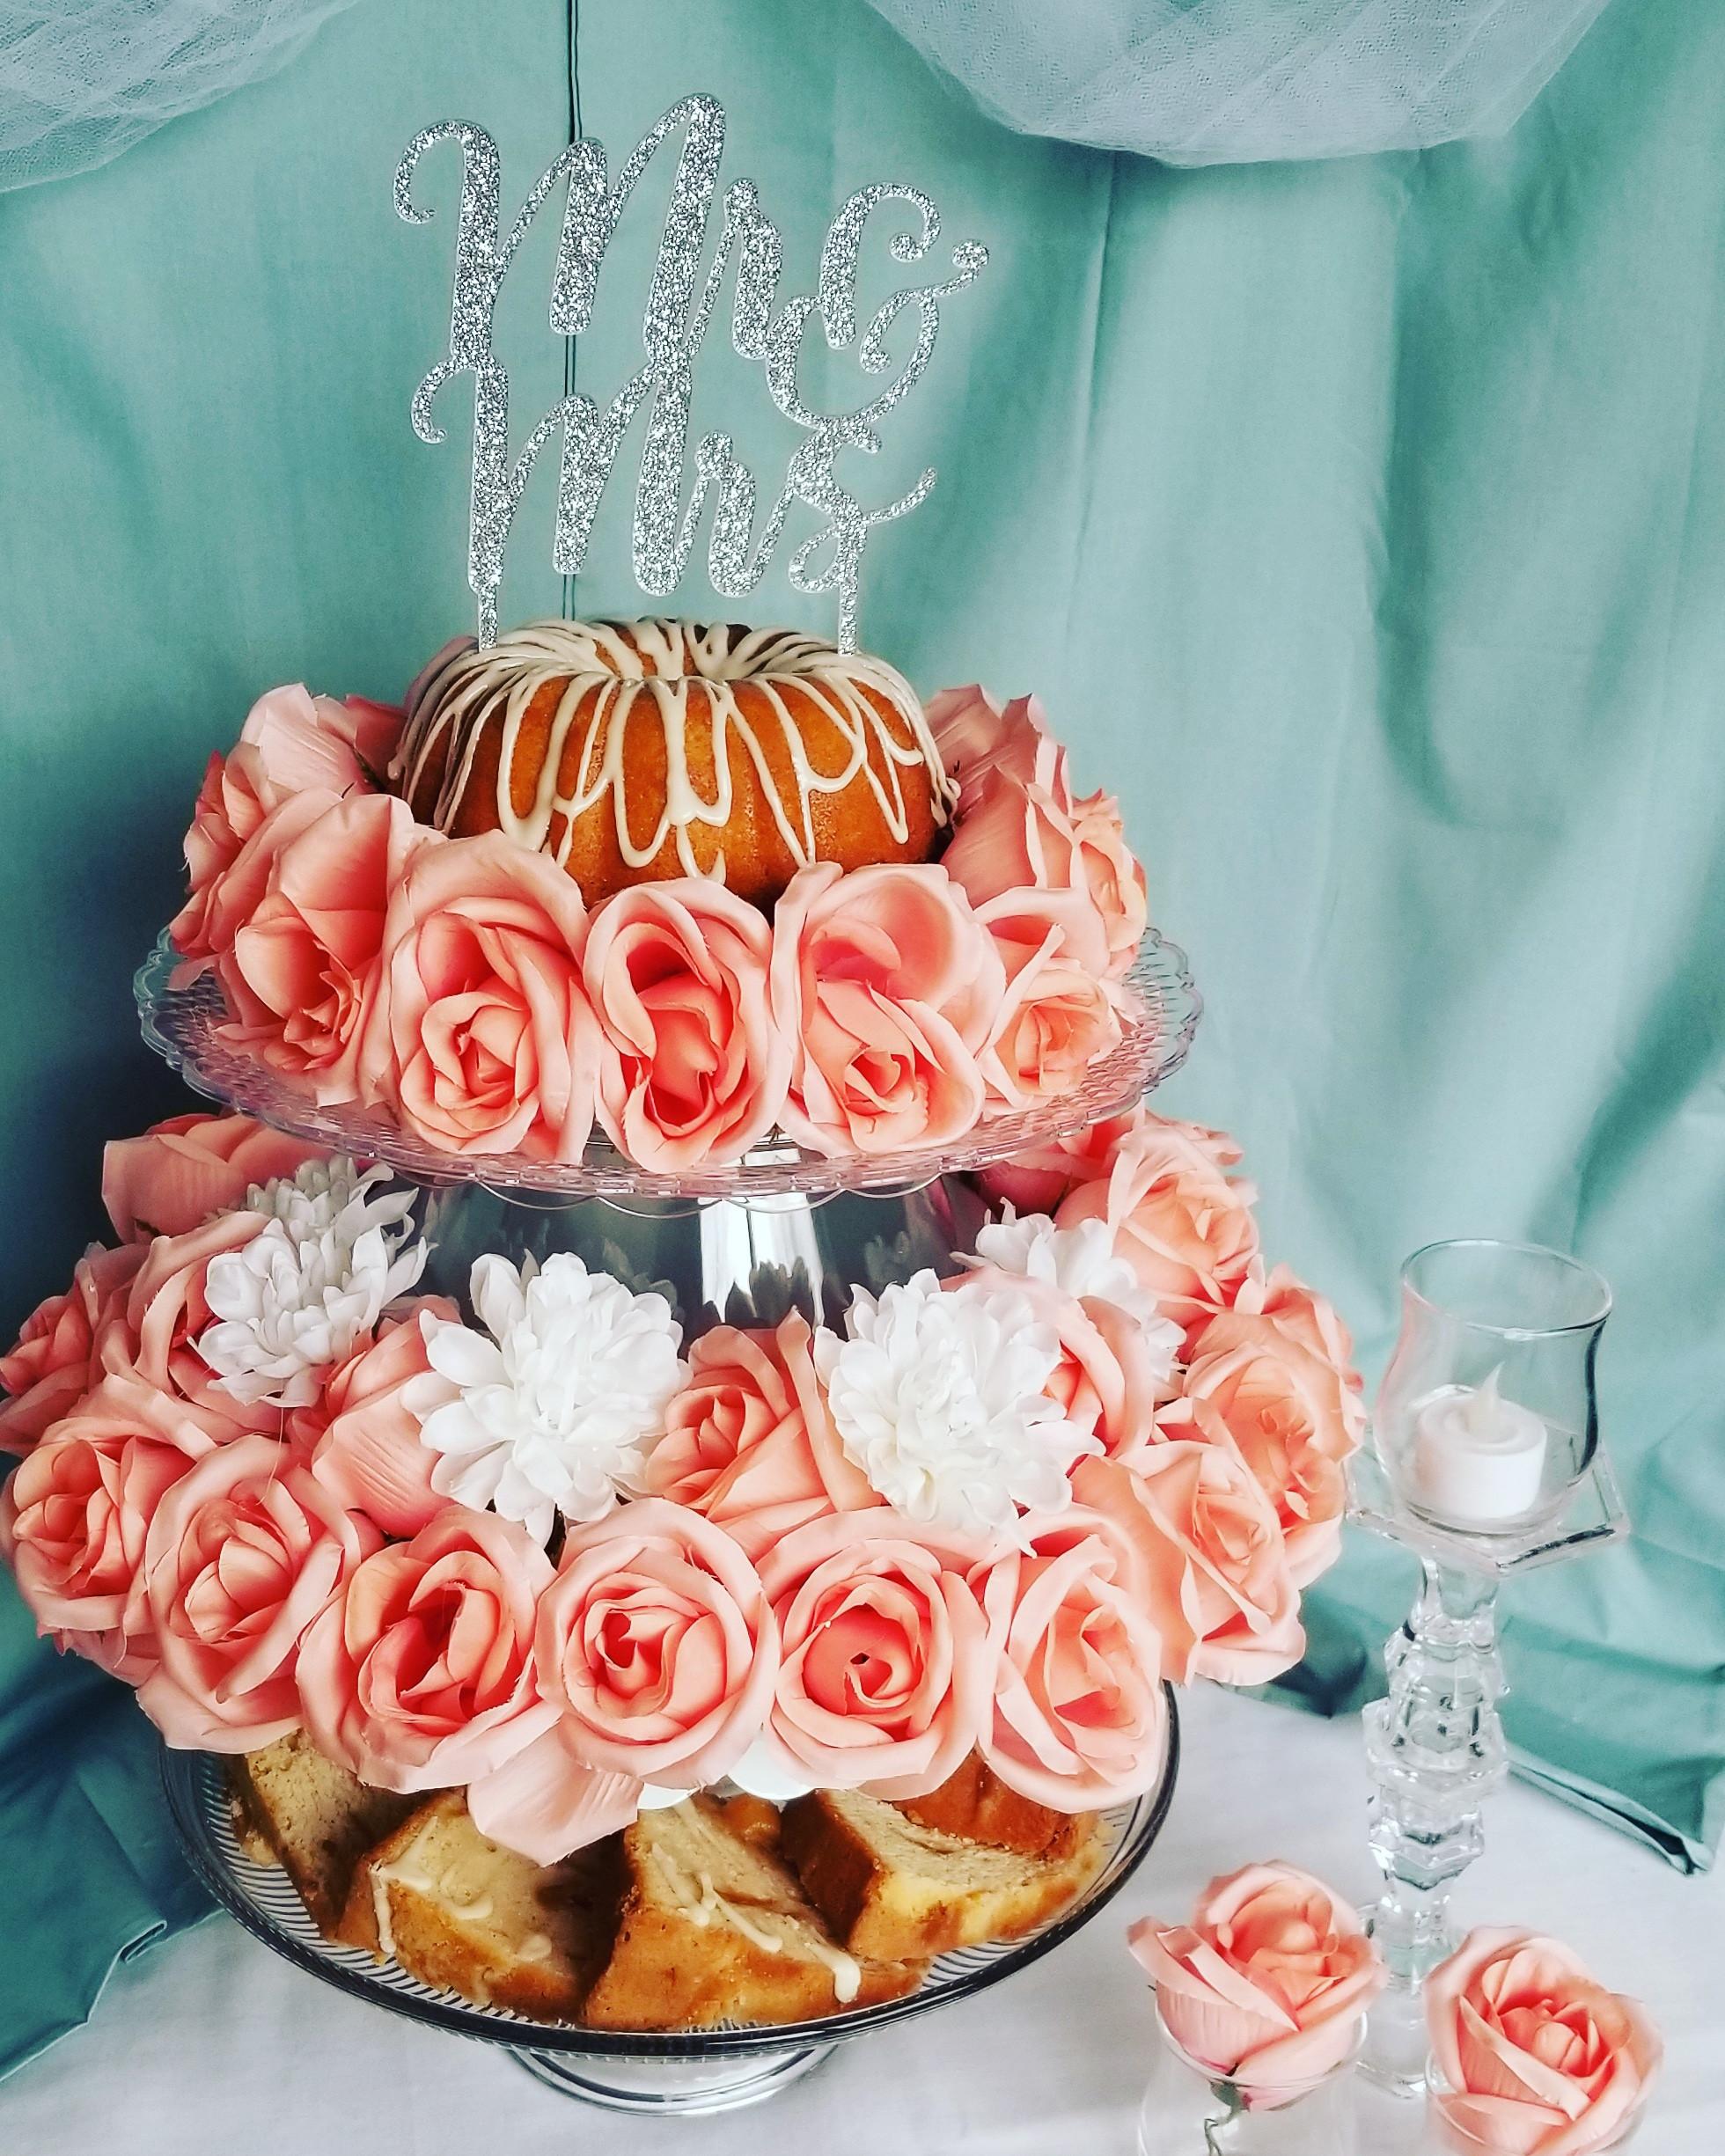 CBR Wedding Cakes